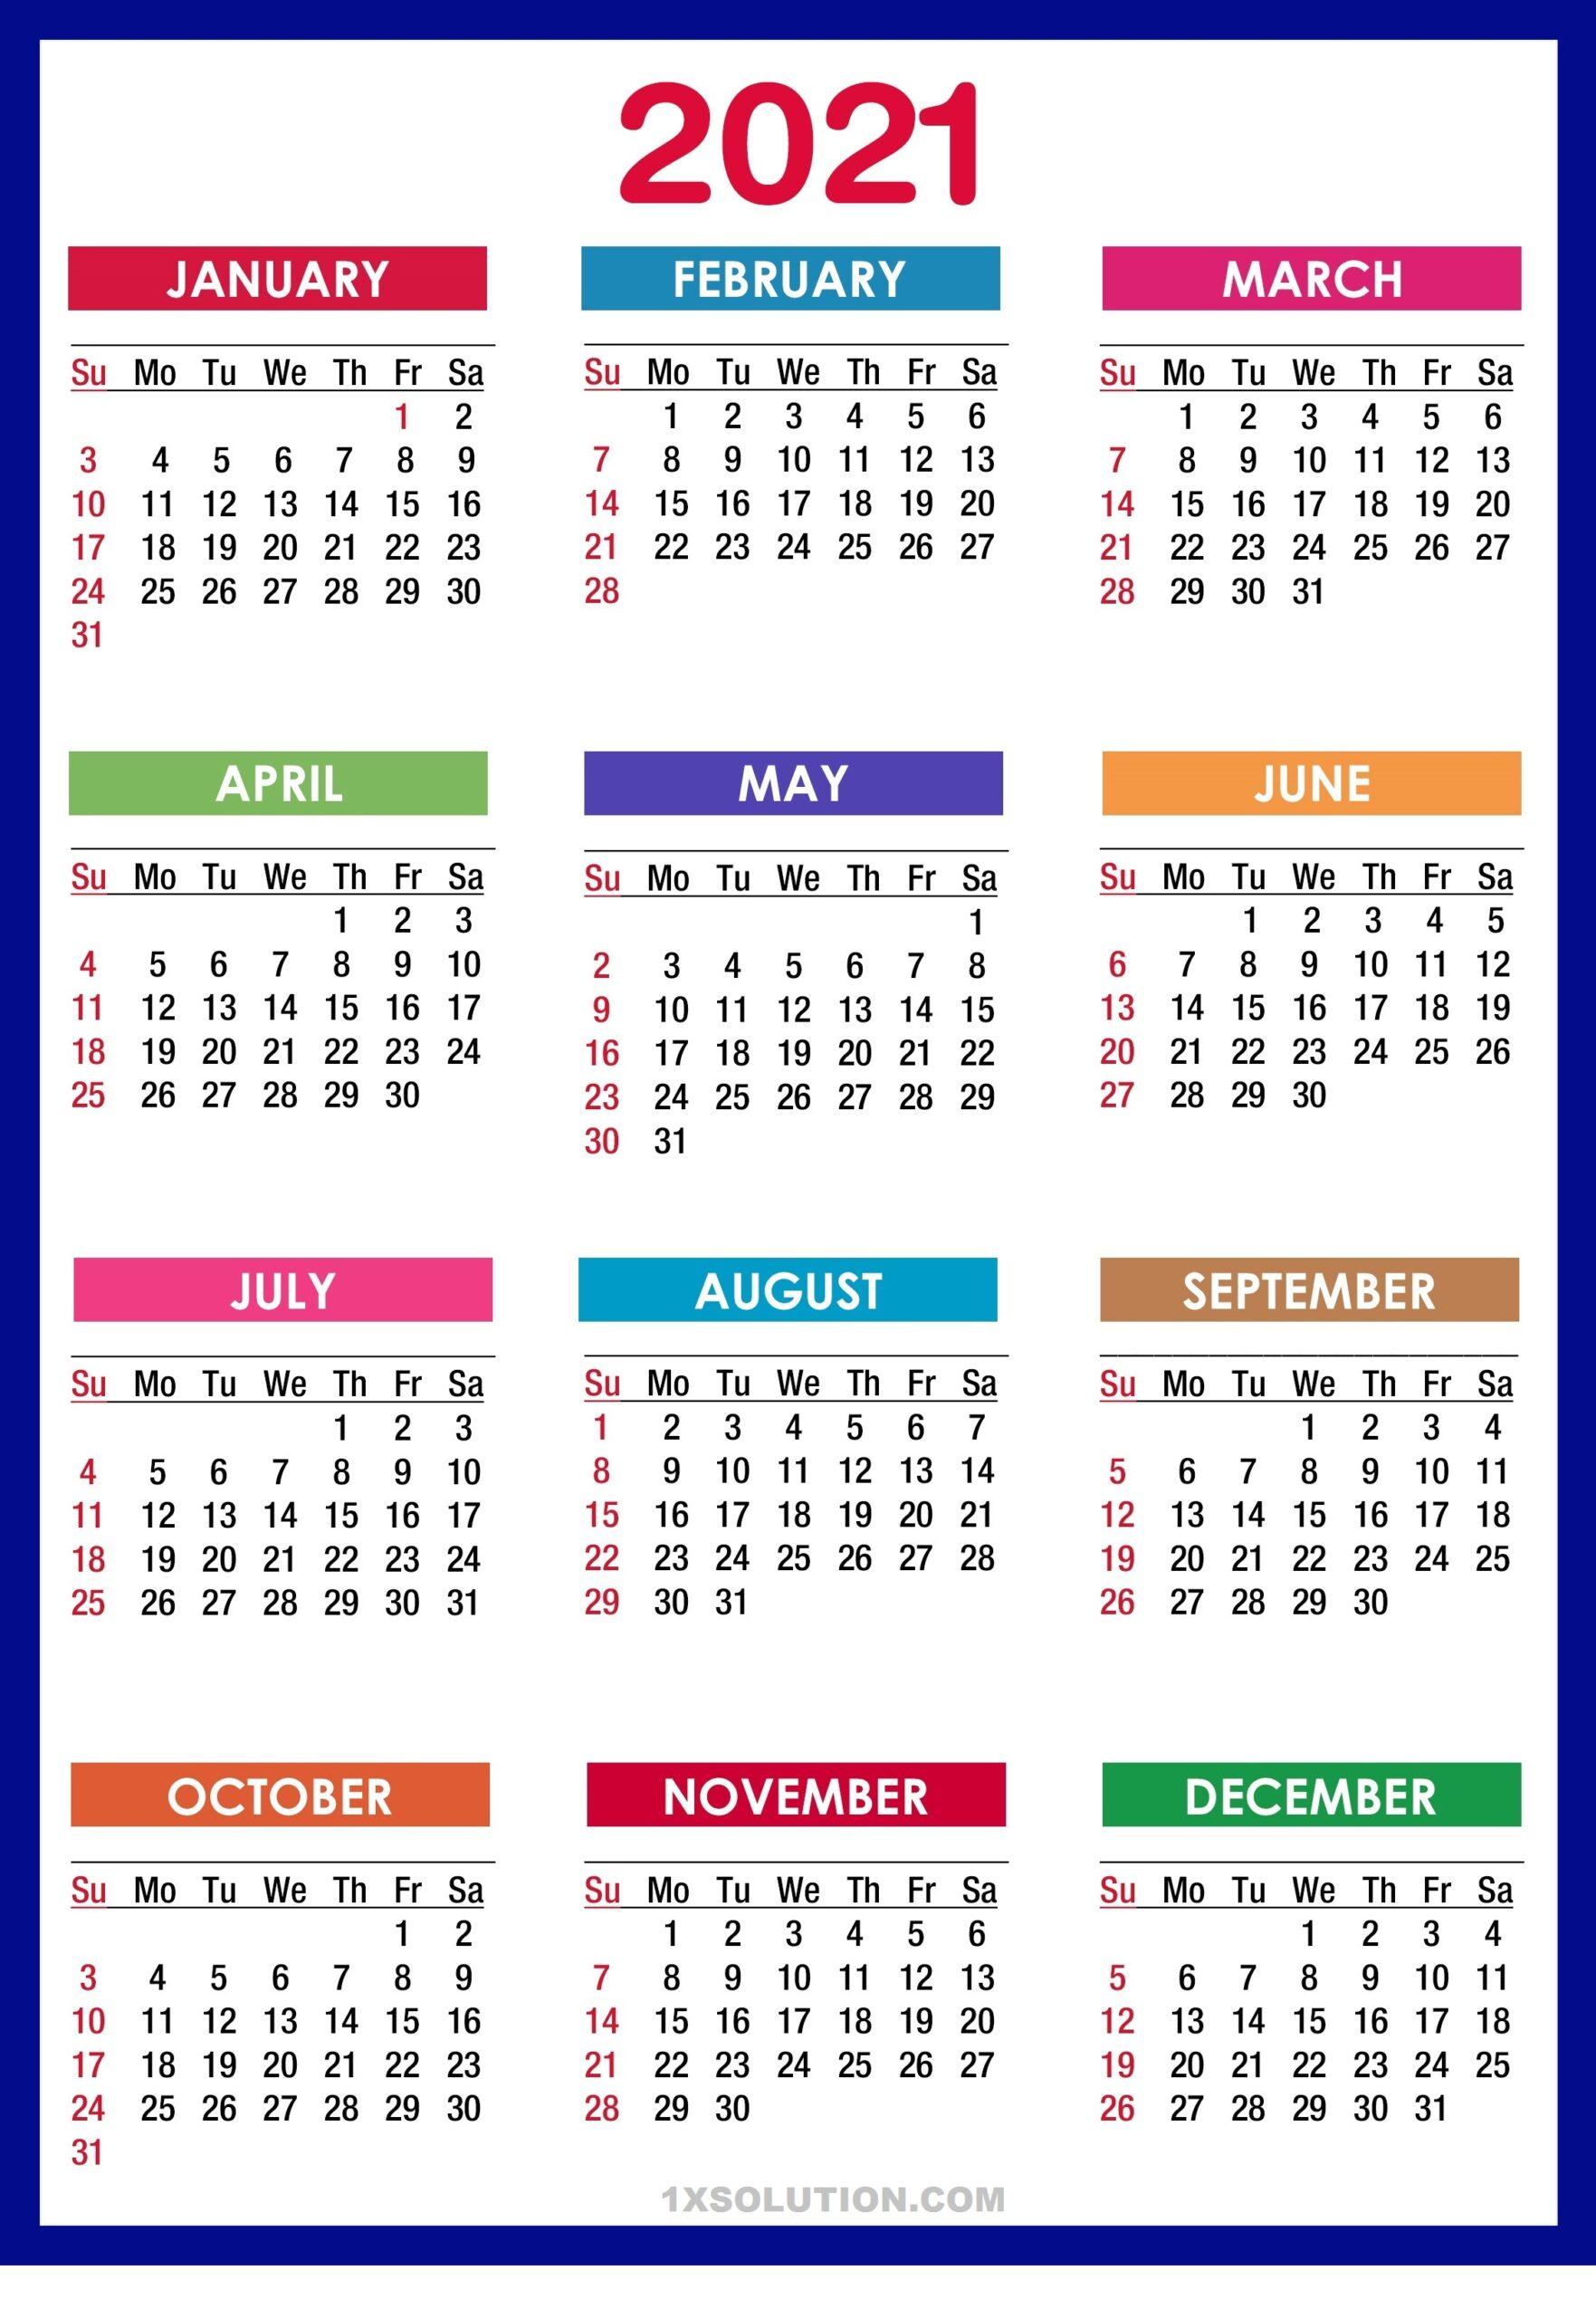 2021 Daily Calendar Holidays Schedule